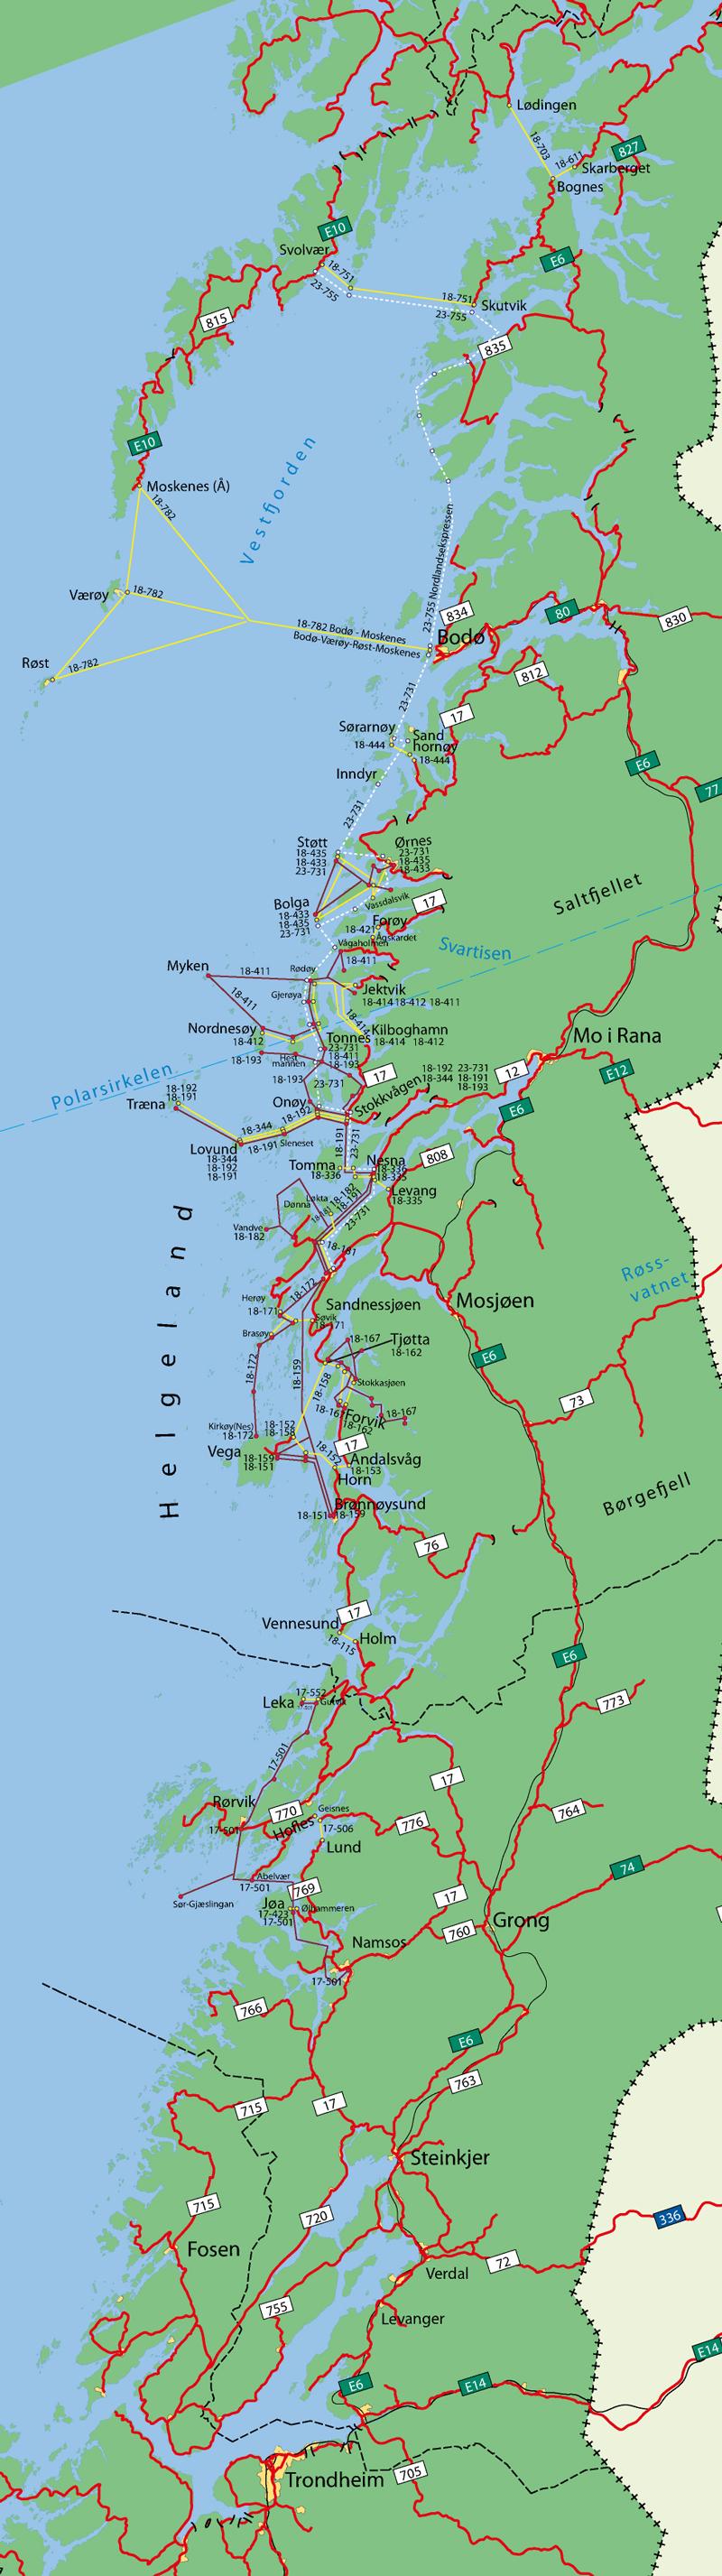 kystriksveien nordland kart Ferjeruter   bussruter   hurtigbåtruter Nordland / Helgeland  kystriksveien nordland kart